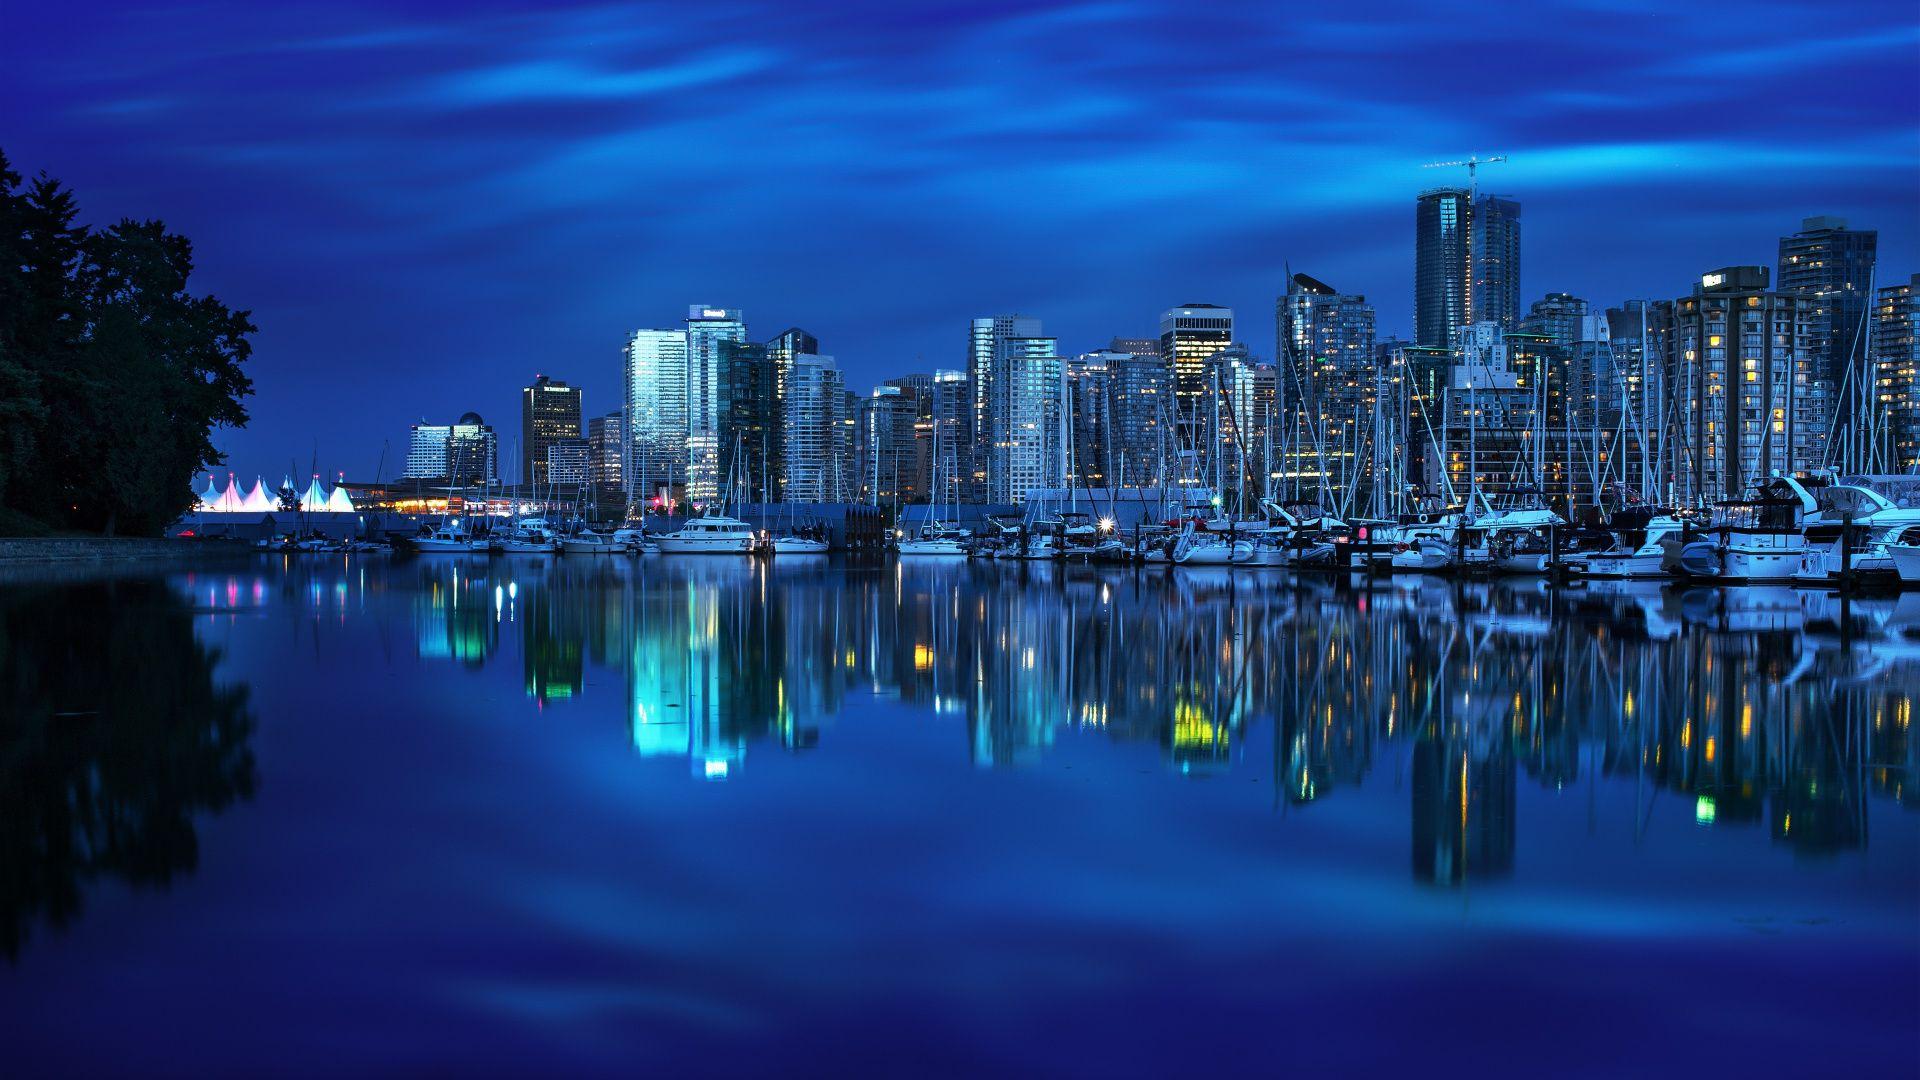 Vancouver wallpaper 1080p